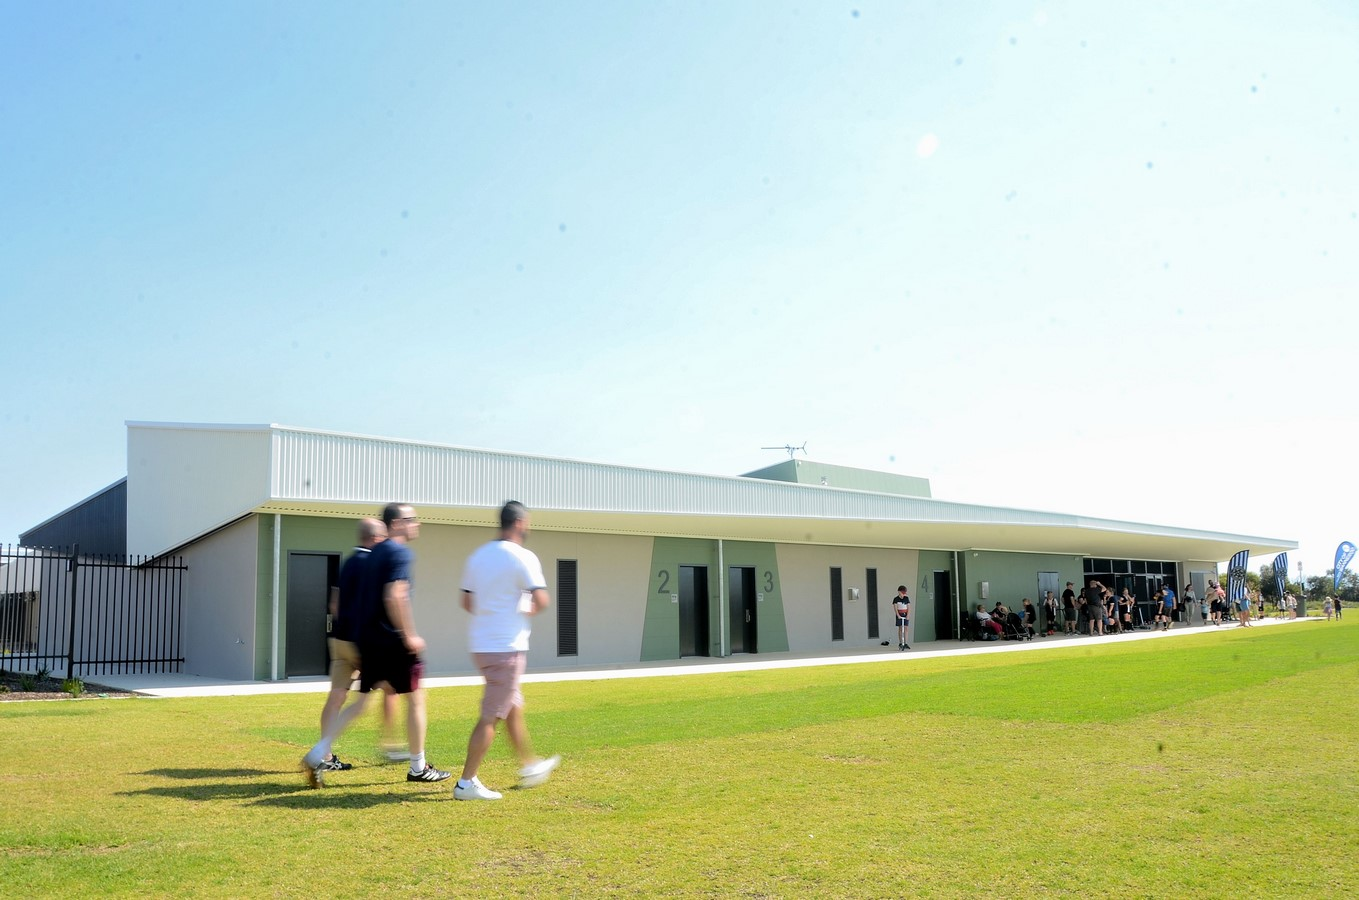 Grandis Park Sports Pavilion, Banksia Grove905 - Sheet1